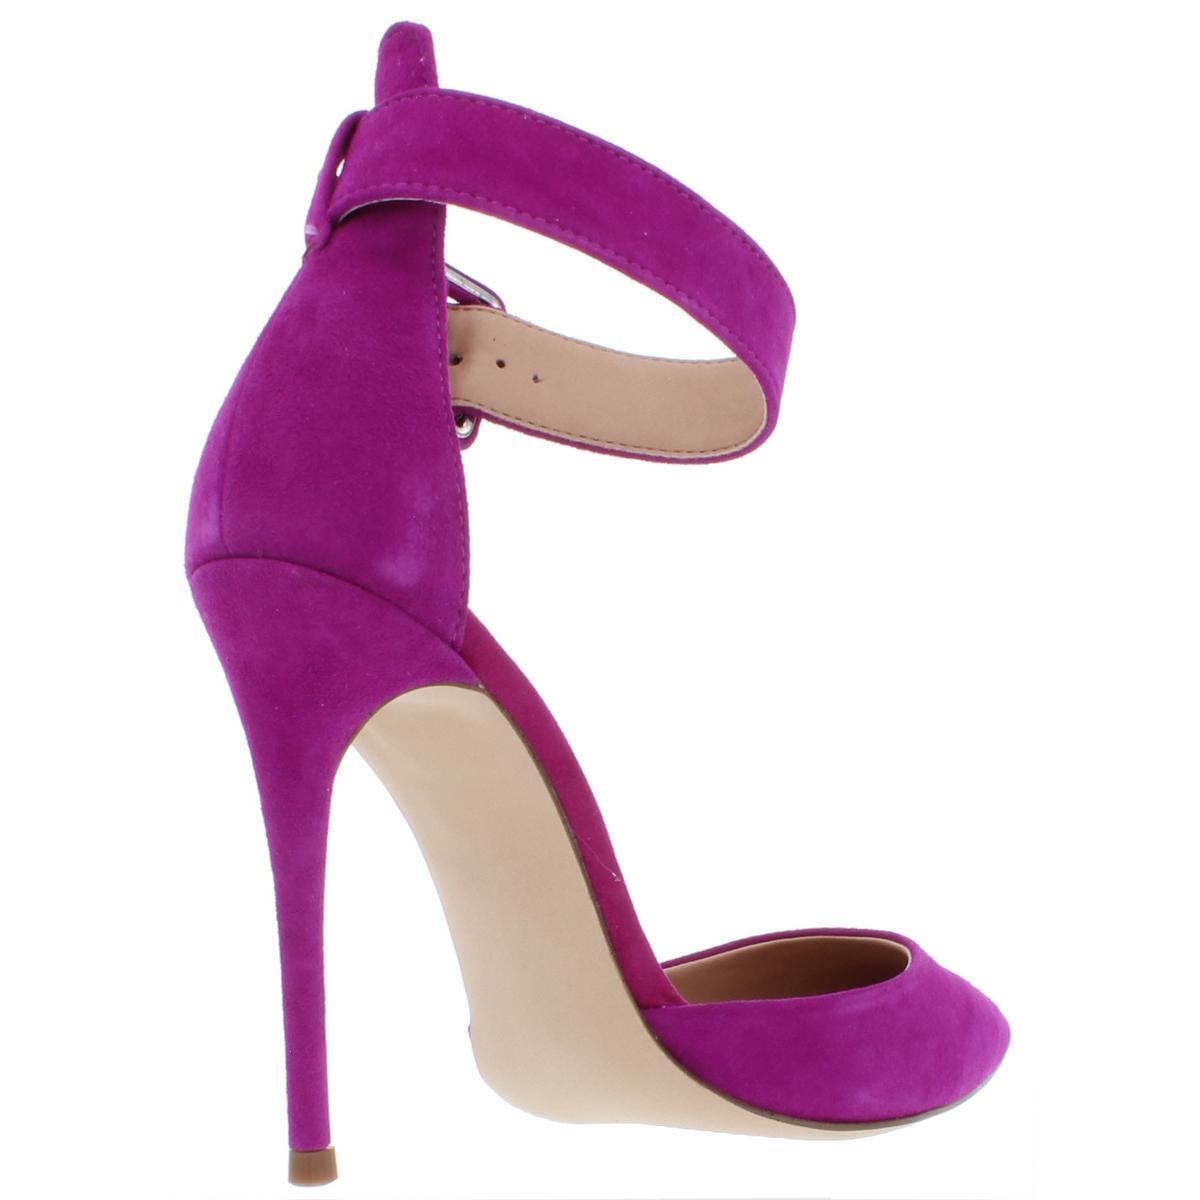 Steve-Madden-Womens-Desire-Padded-Insole-Stiletto-Dress-Heels-Shoes-BHFO-0454 thumbnail 8